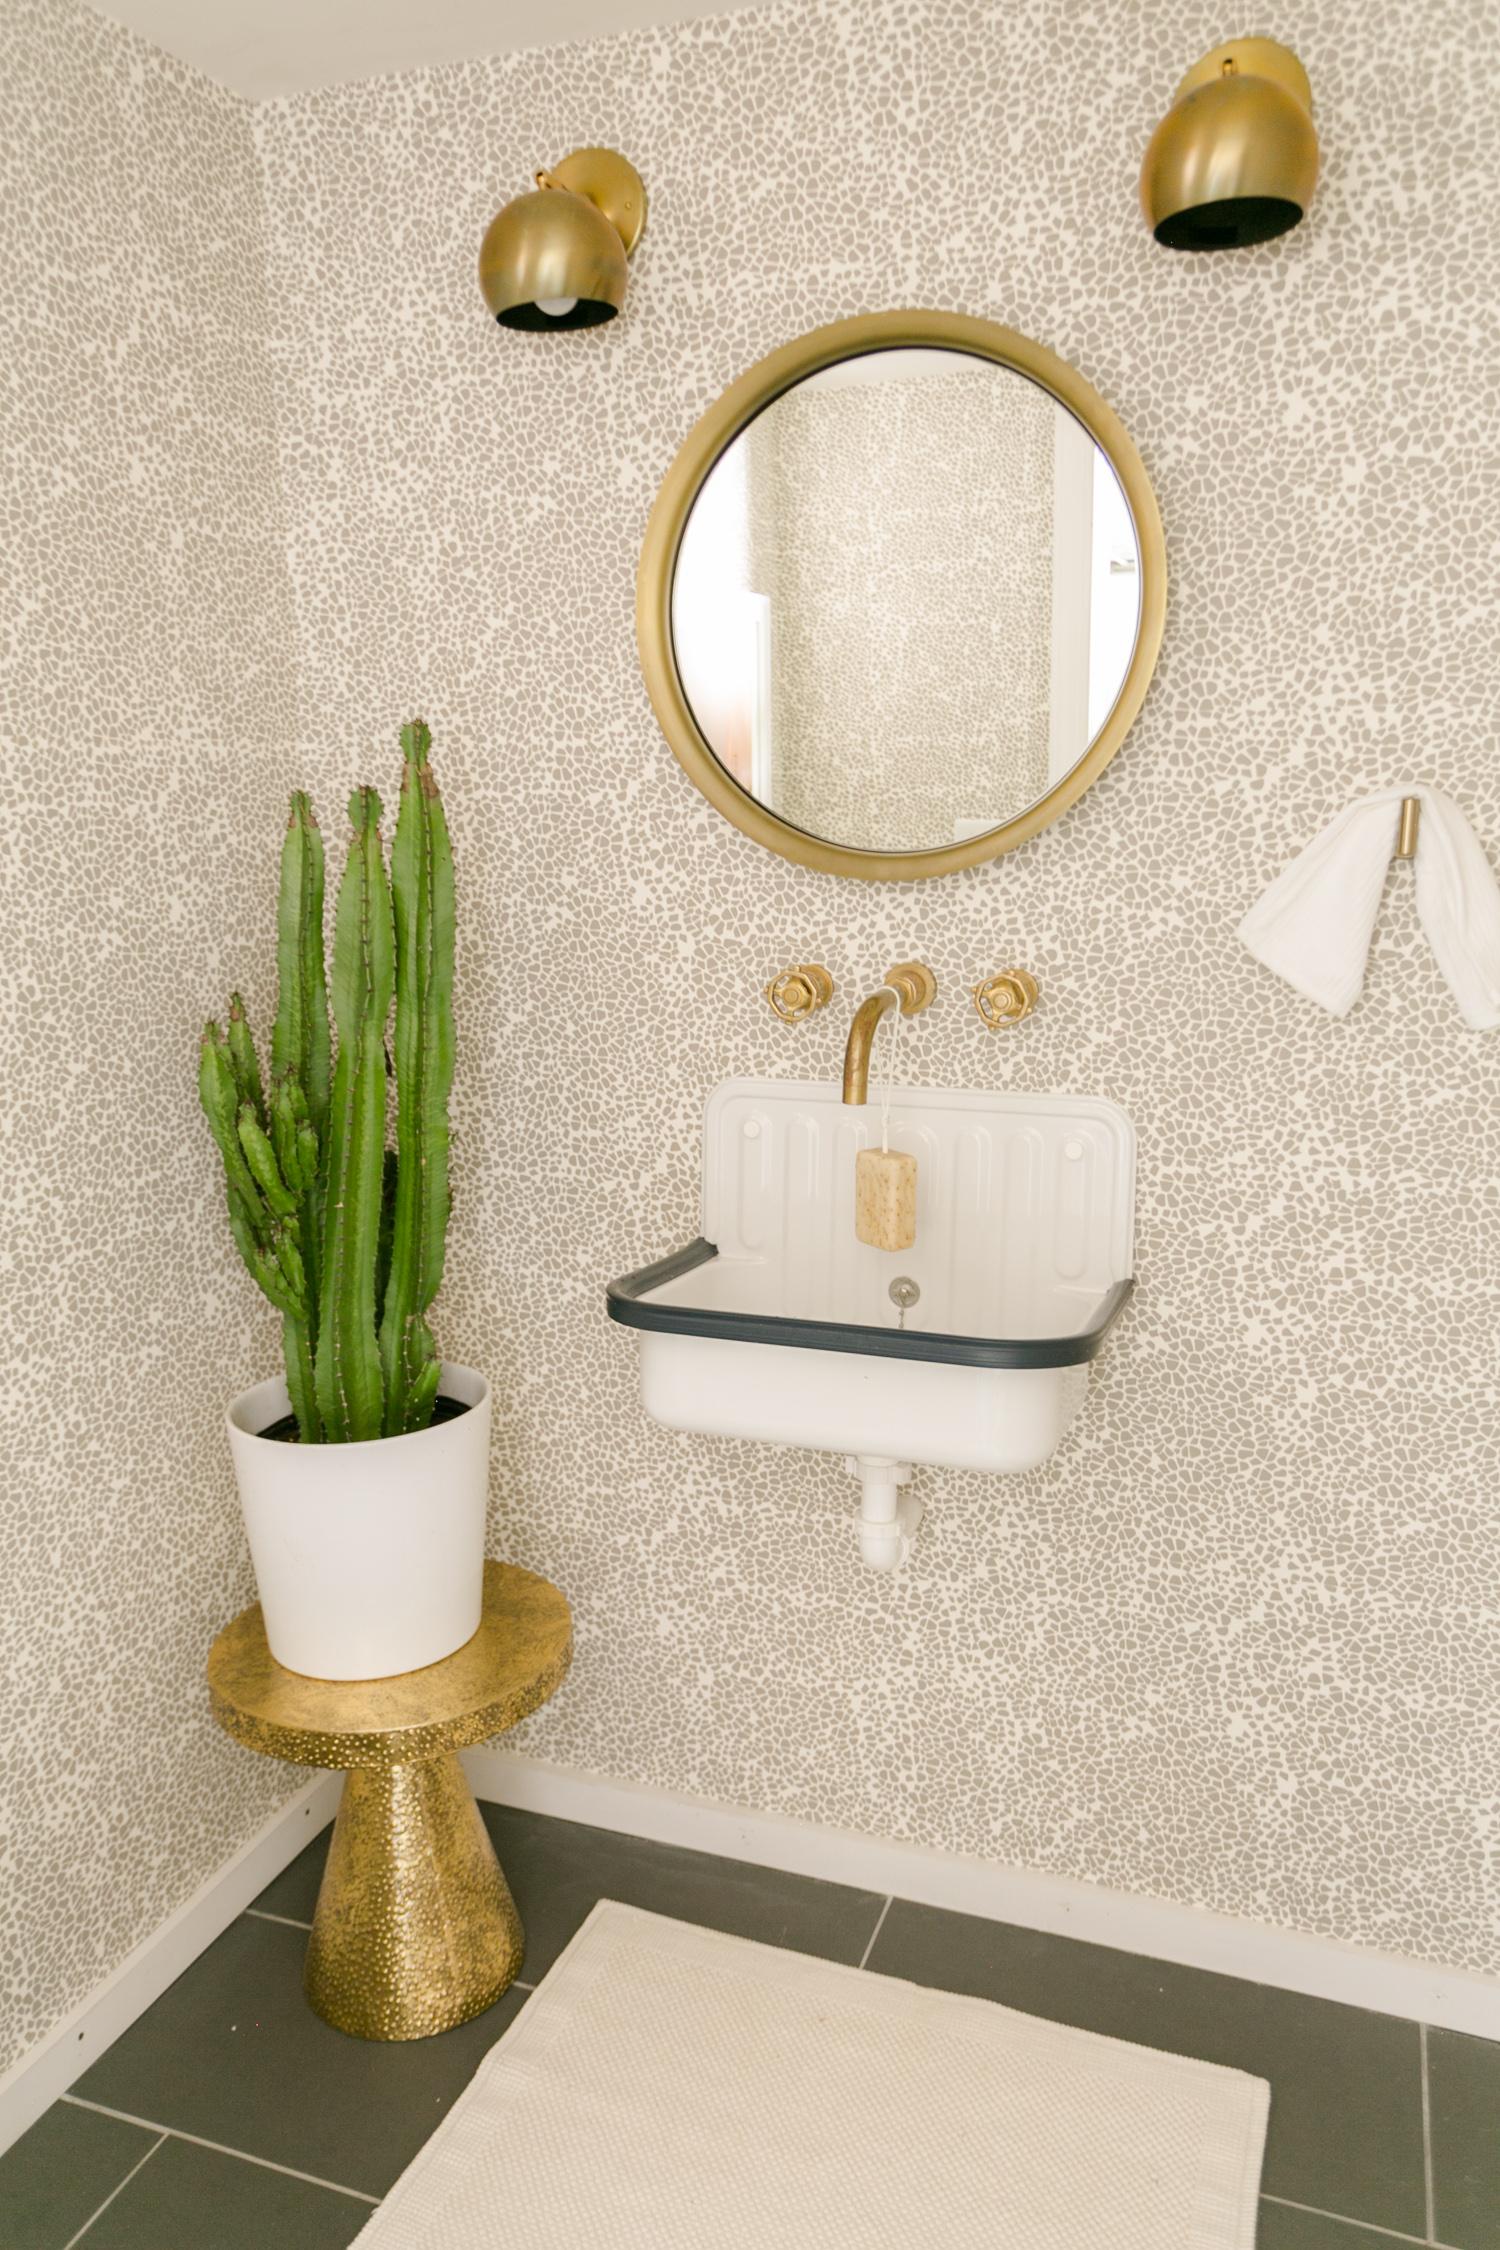 Studio Bathroom (AKA My Final Home Tour- WHAT?!)